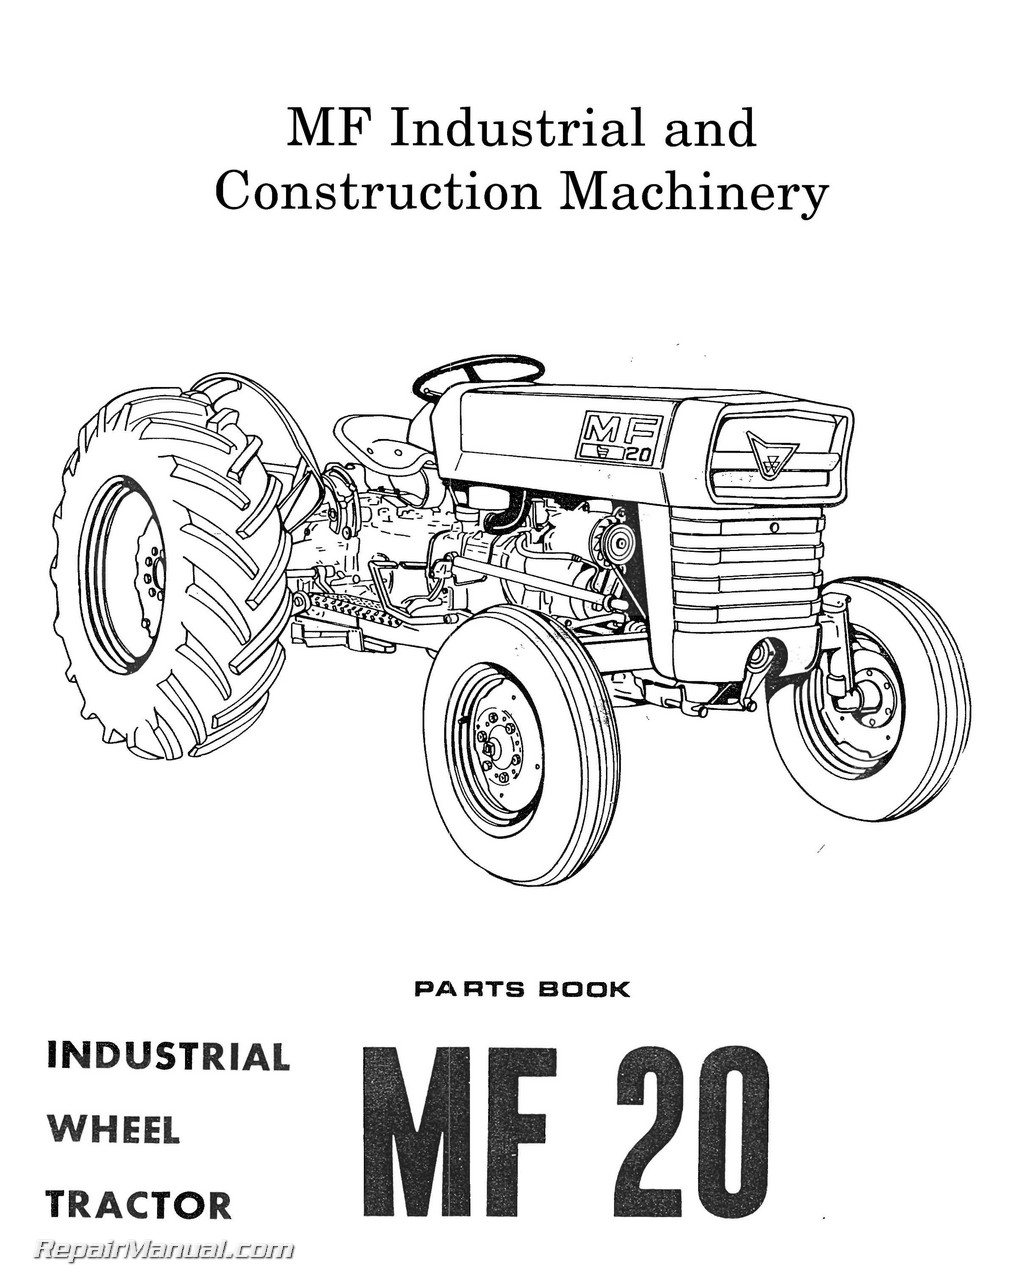 Massey Ferguson Model Mf20 Mf25 Mf30 Industrial Wheel Tractor Parts Manual